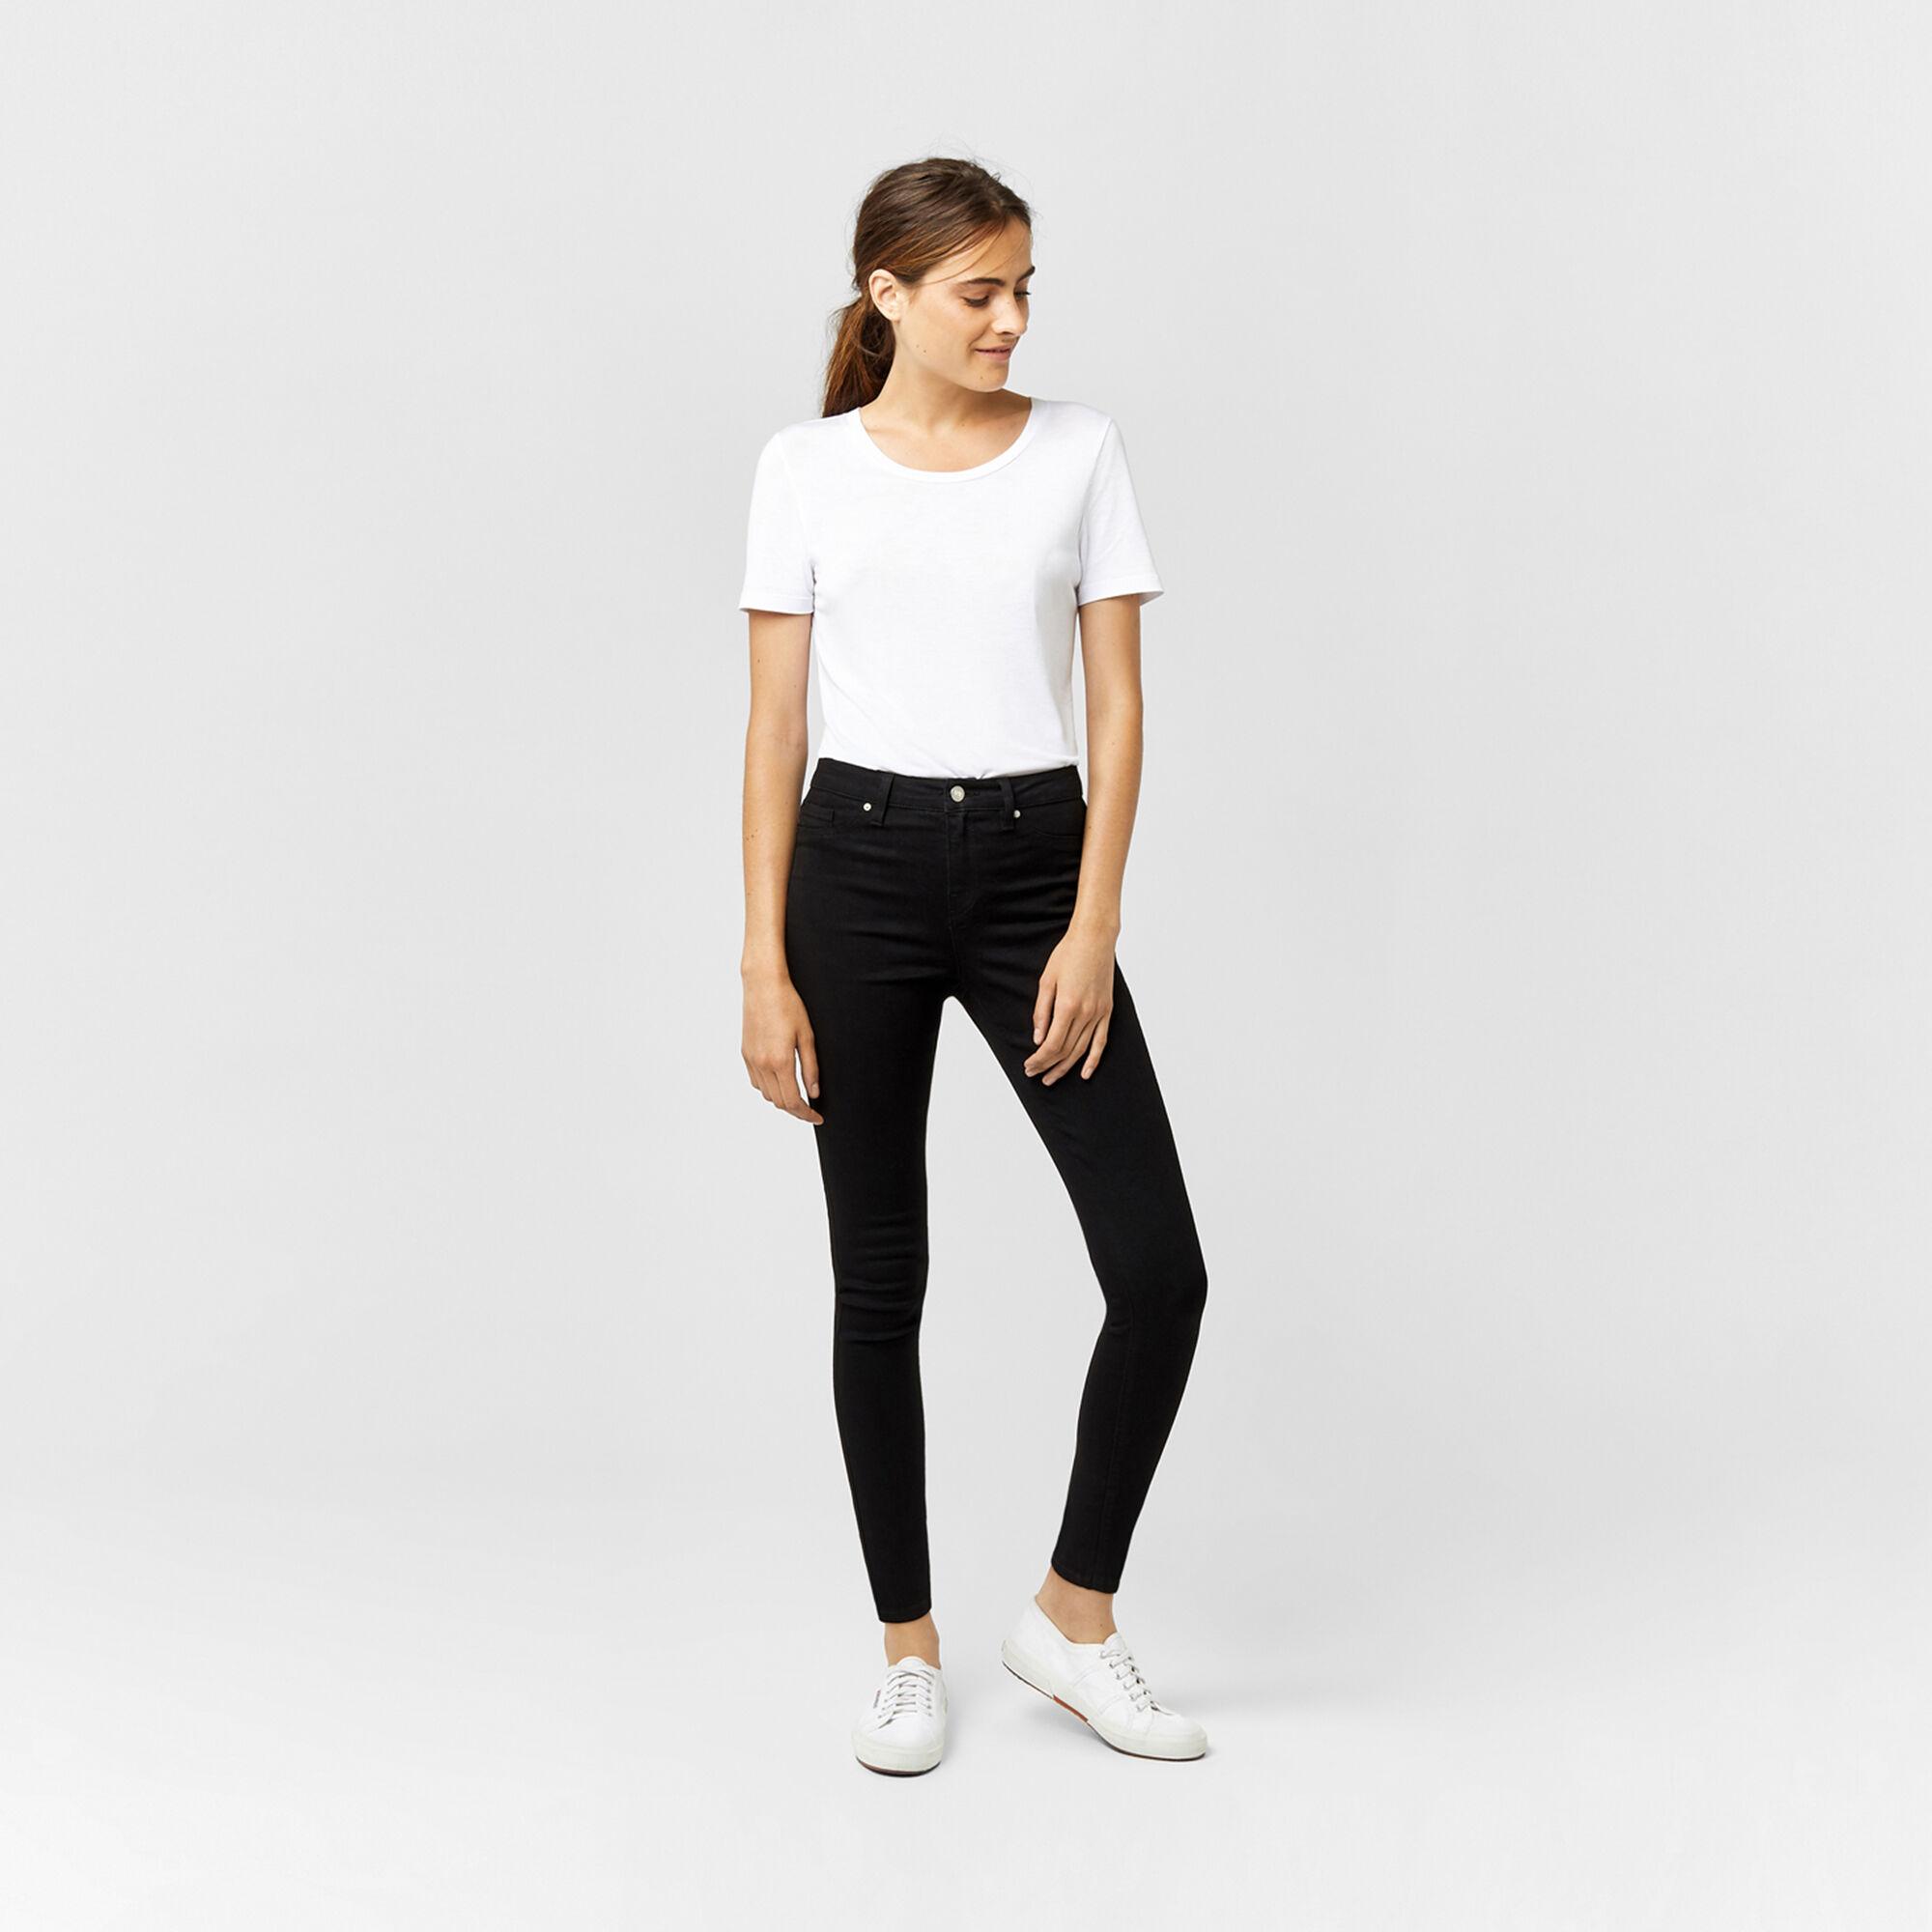 Warehouse, Ultra Skinny Cut Jeans Black 1